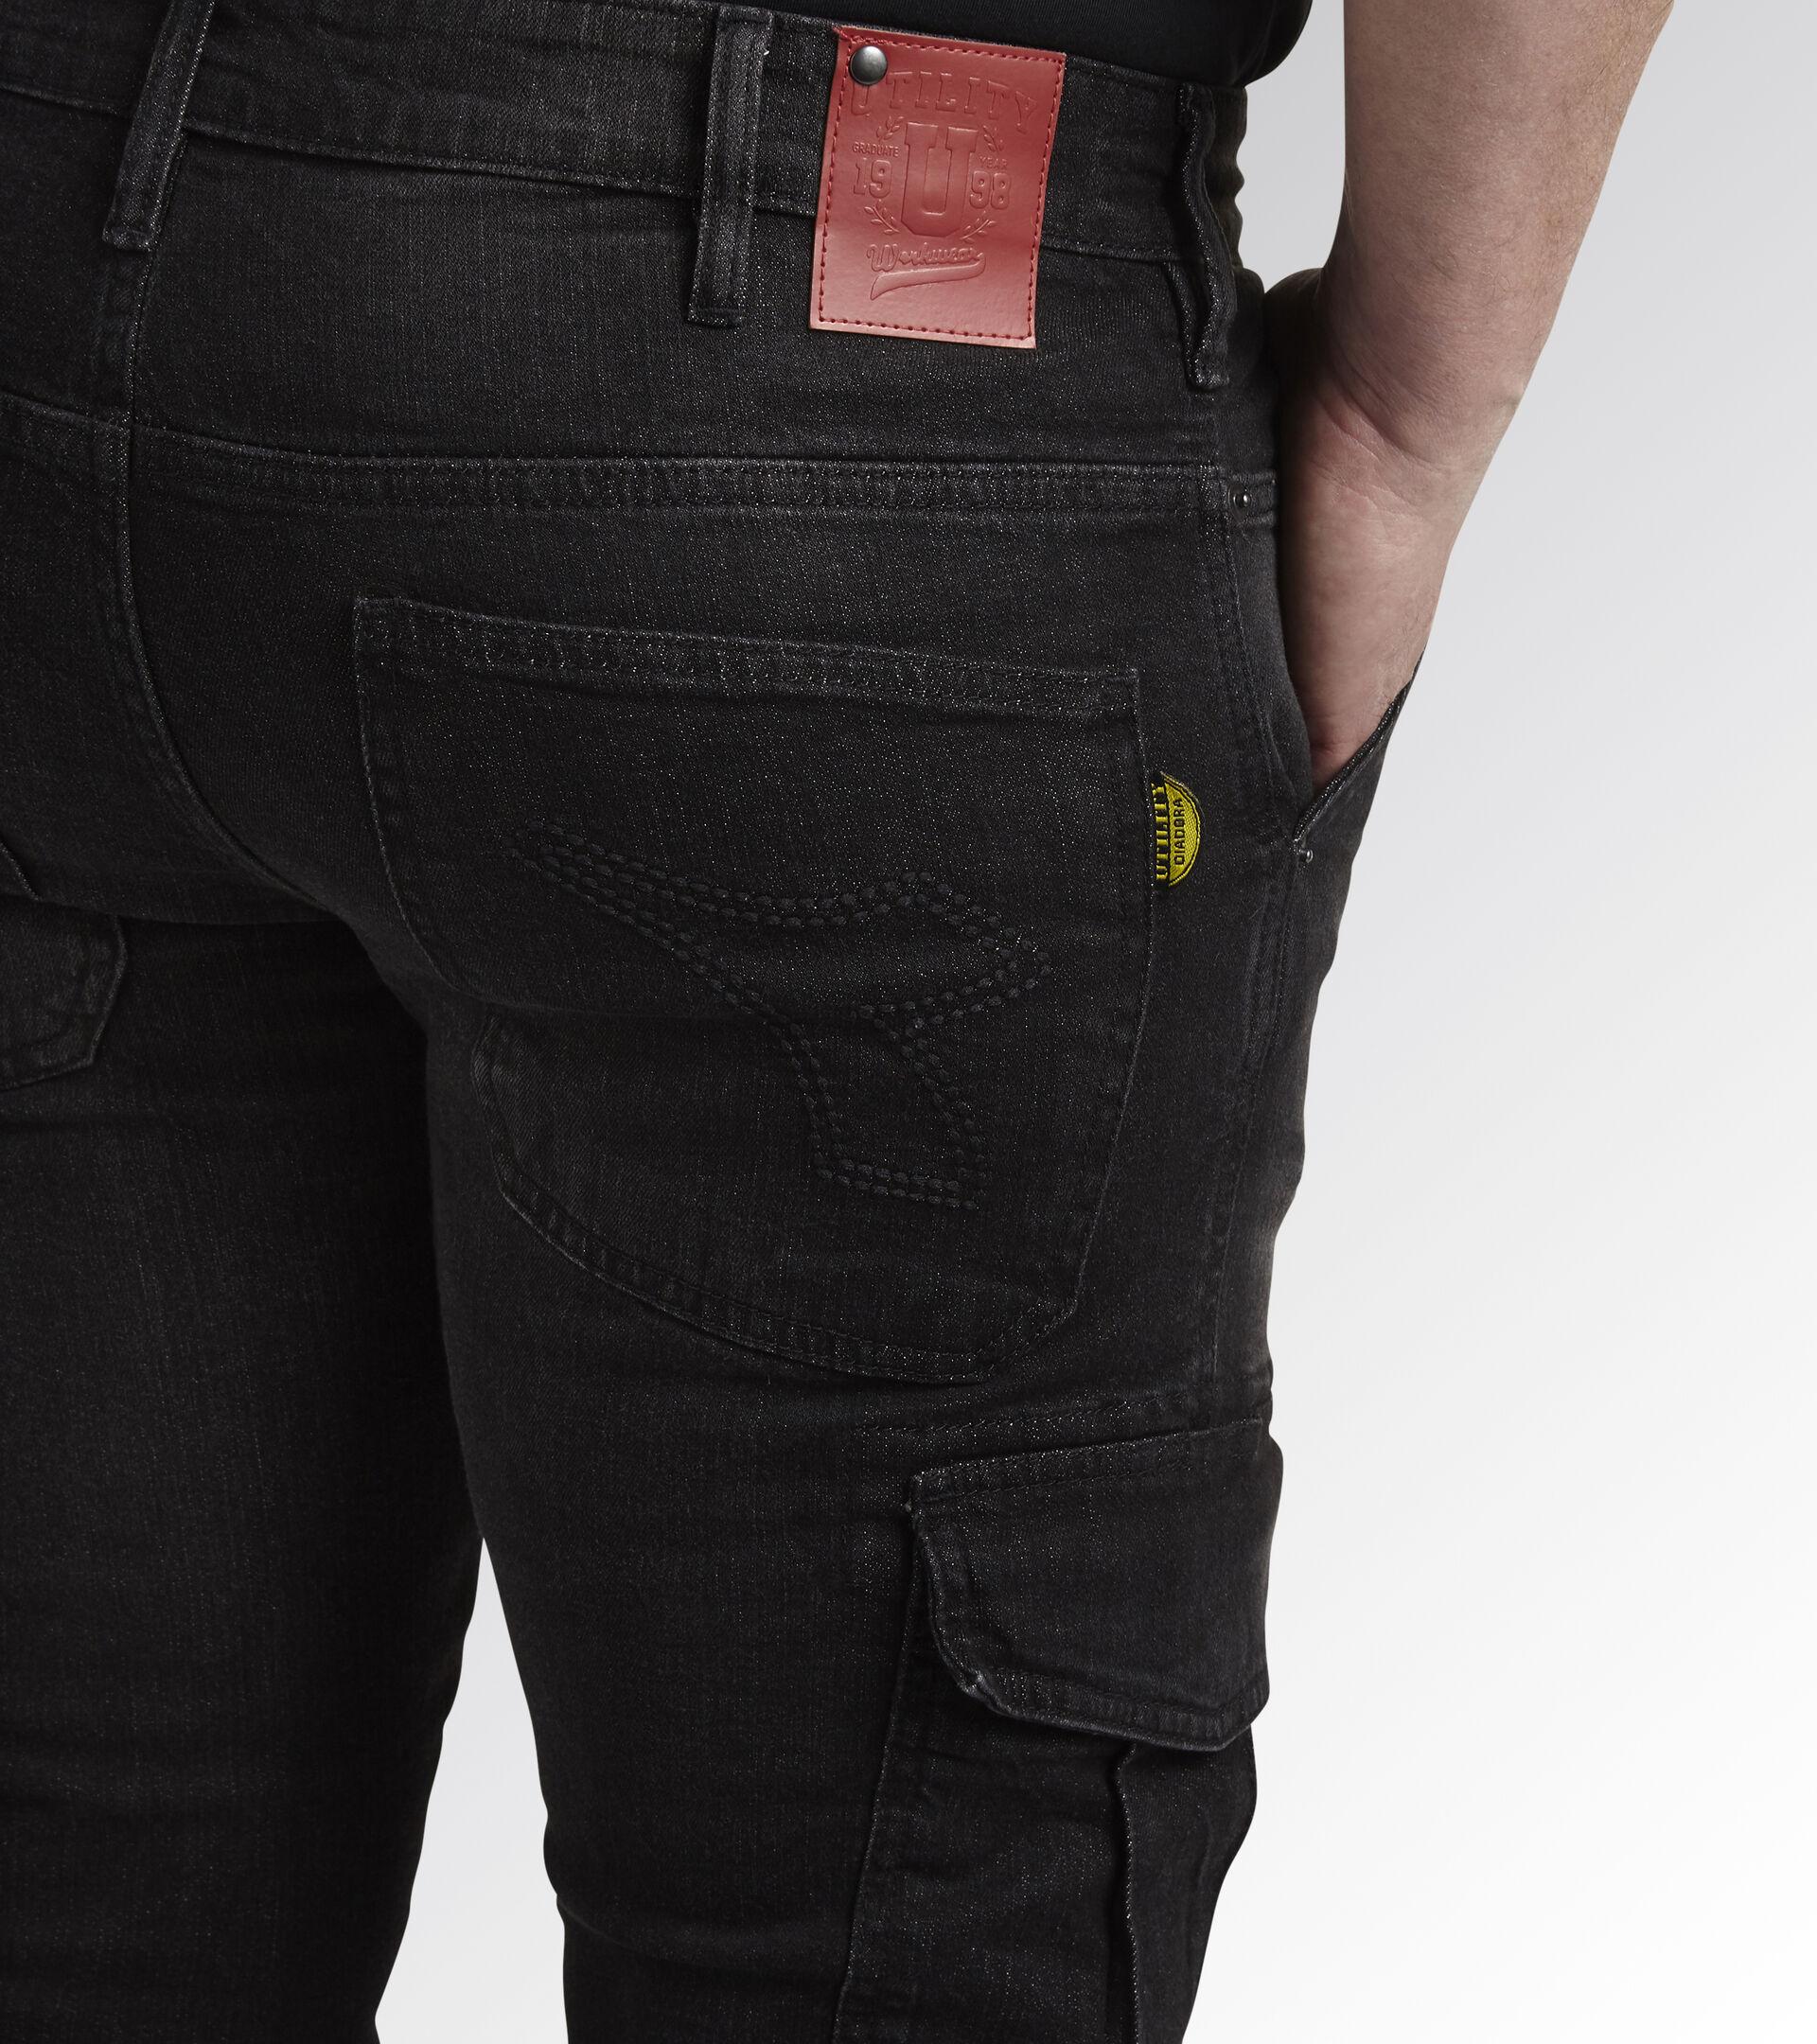 Apparel Utility UOMO PANT STONE CARGO NEW BLACK WASHING Utility